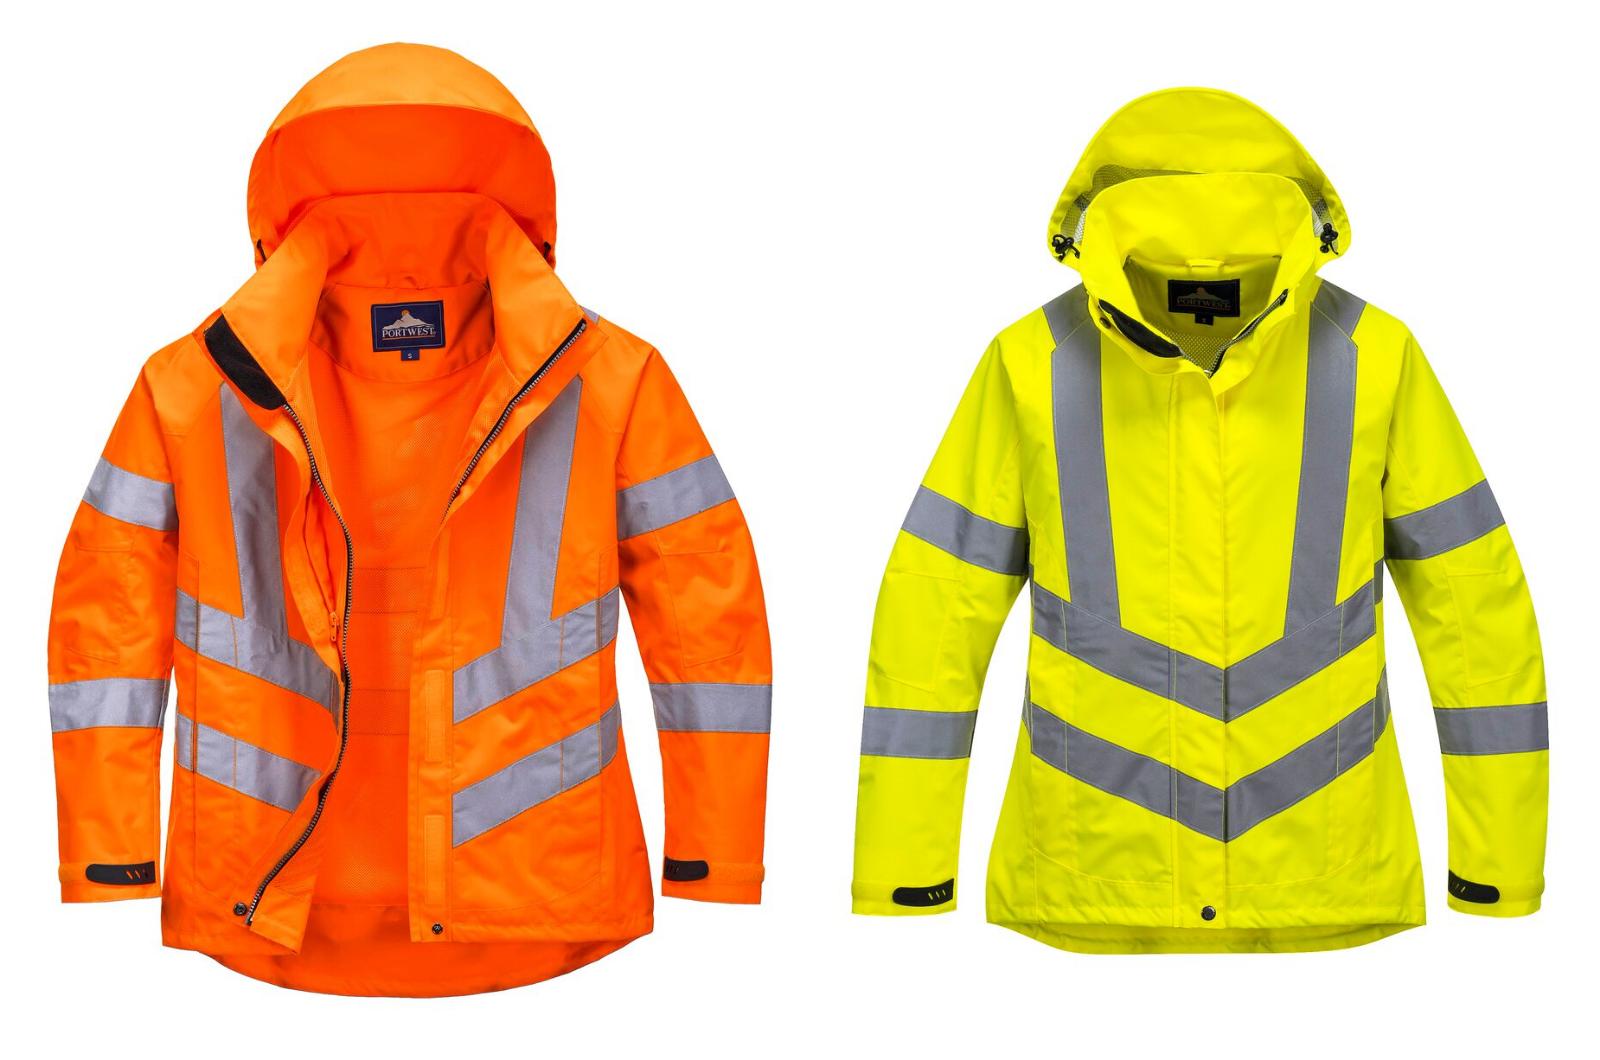 Portwest LW70 Ladies Hi Vis Breathable Jacket Bodywarmer Coa